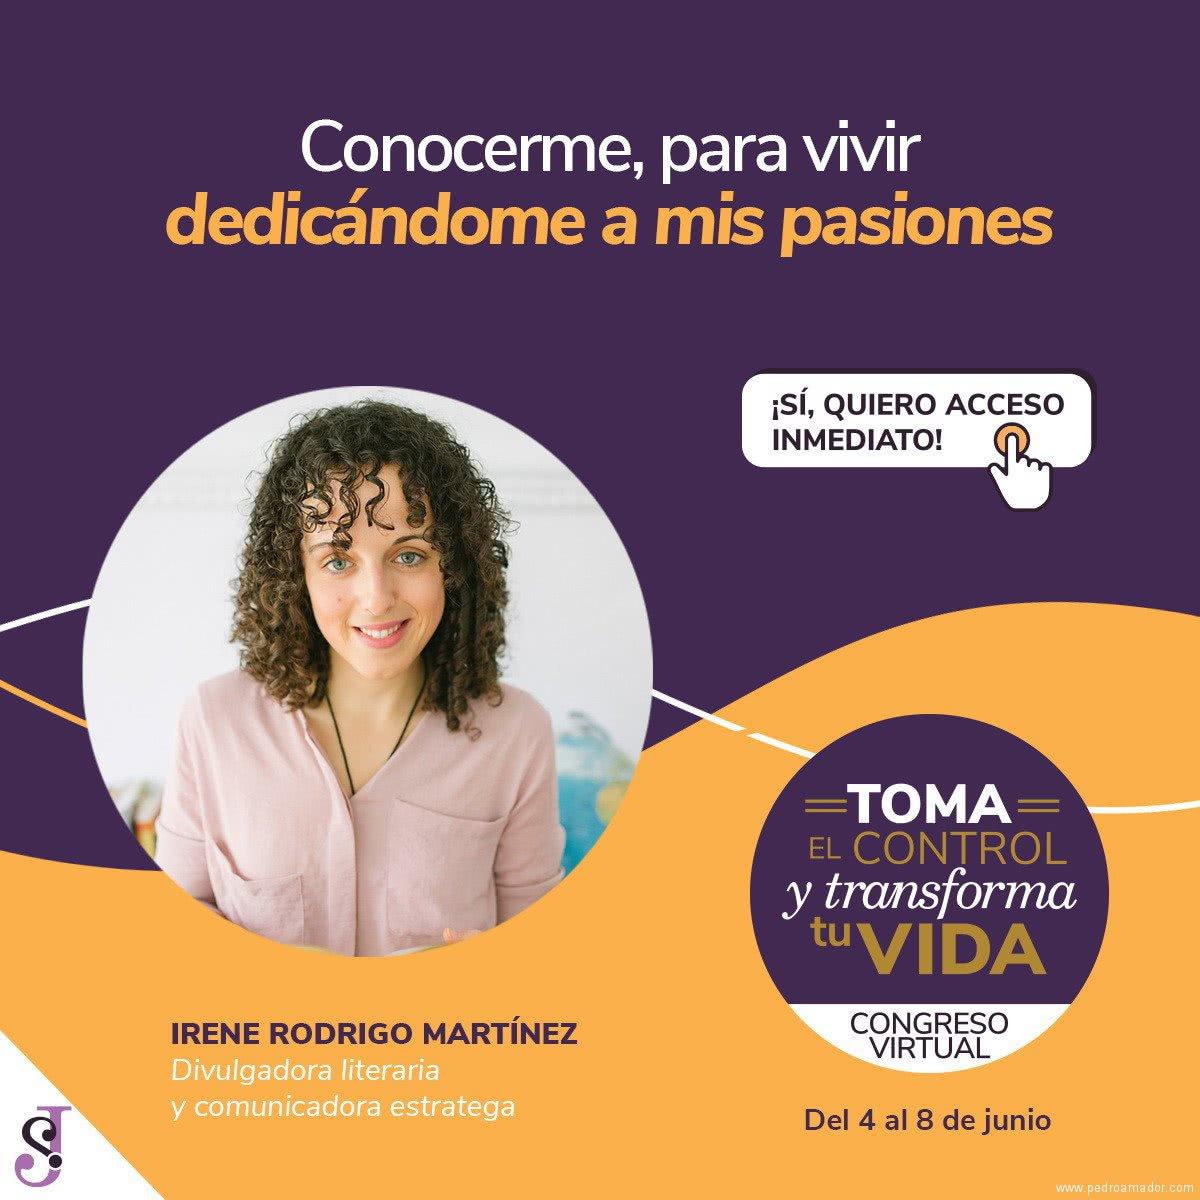 Transforma tu vida - Irene Rodrigo Martínez